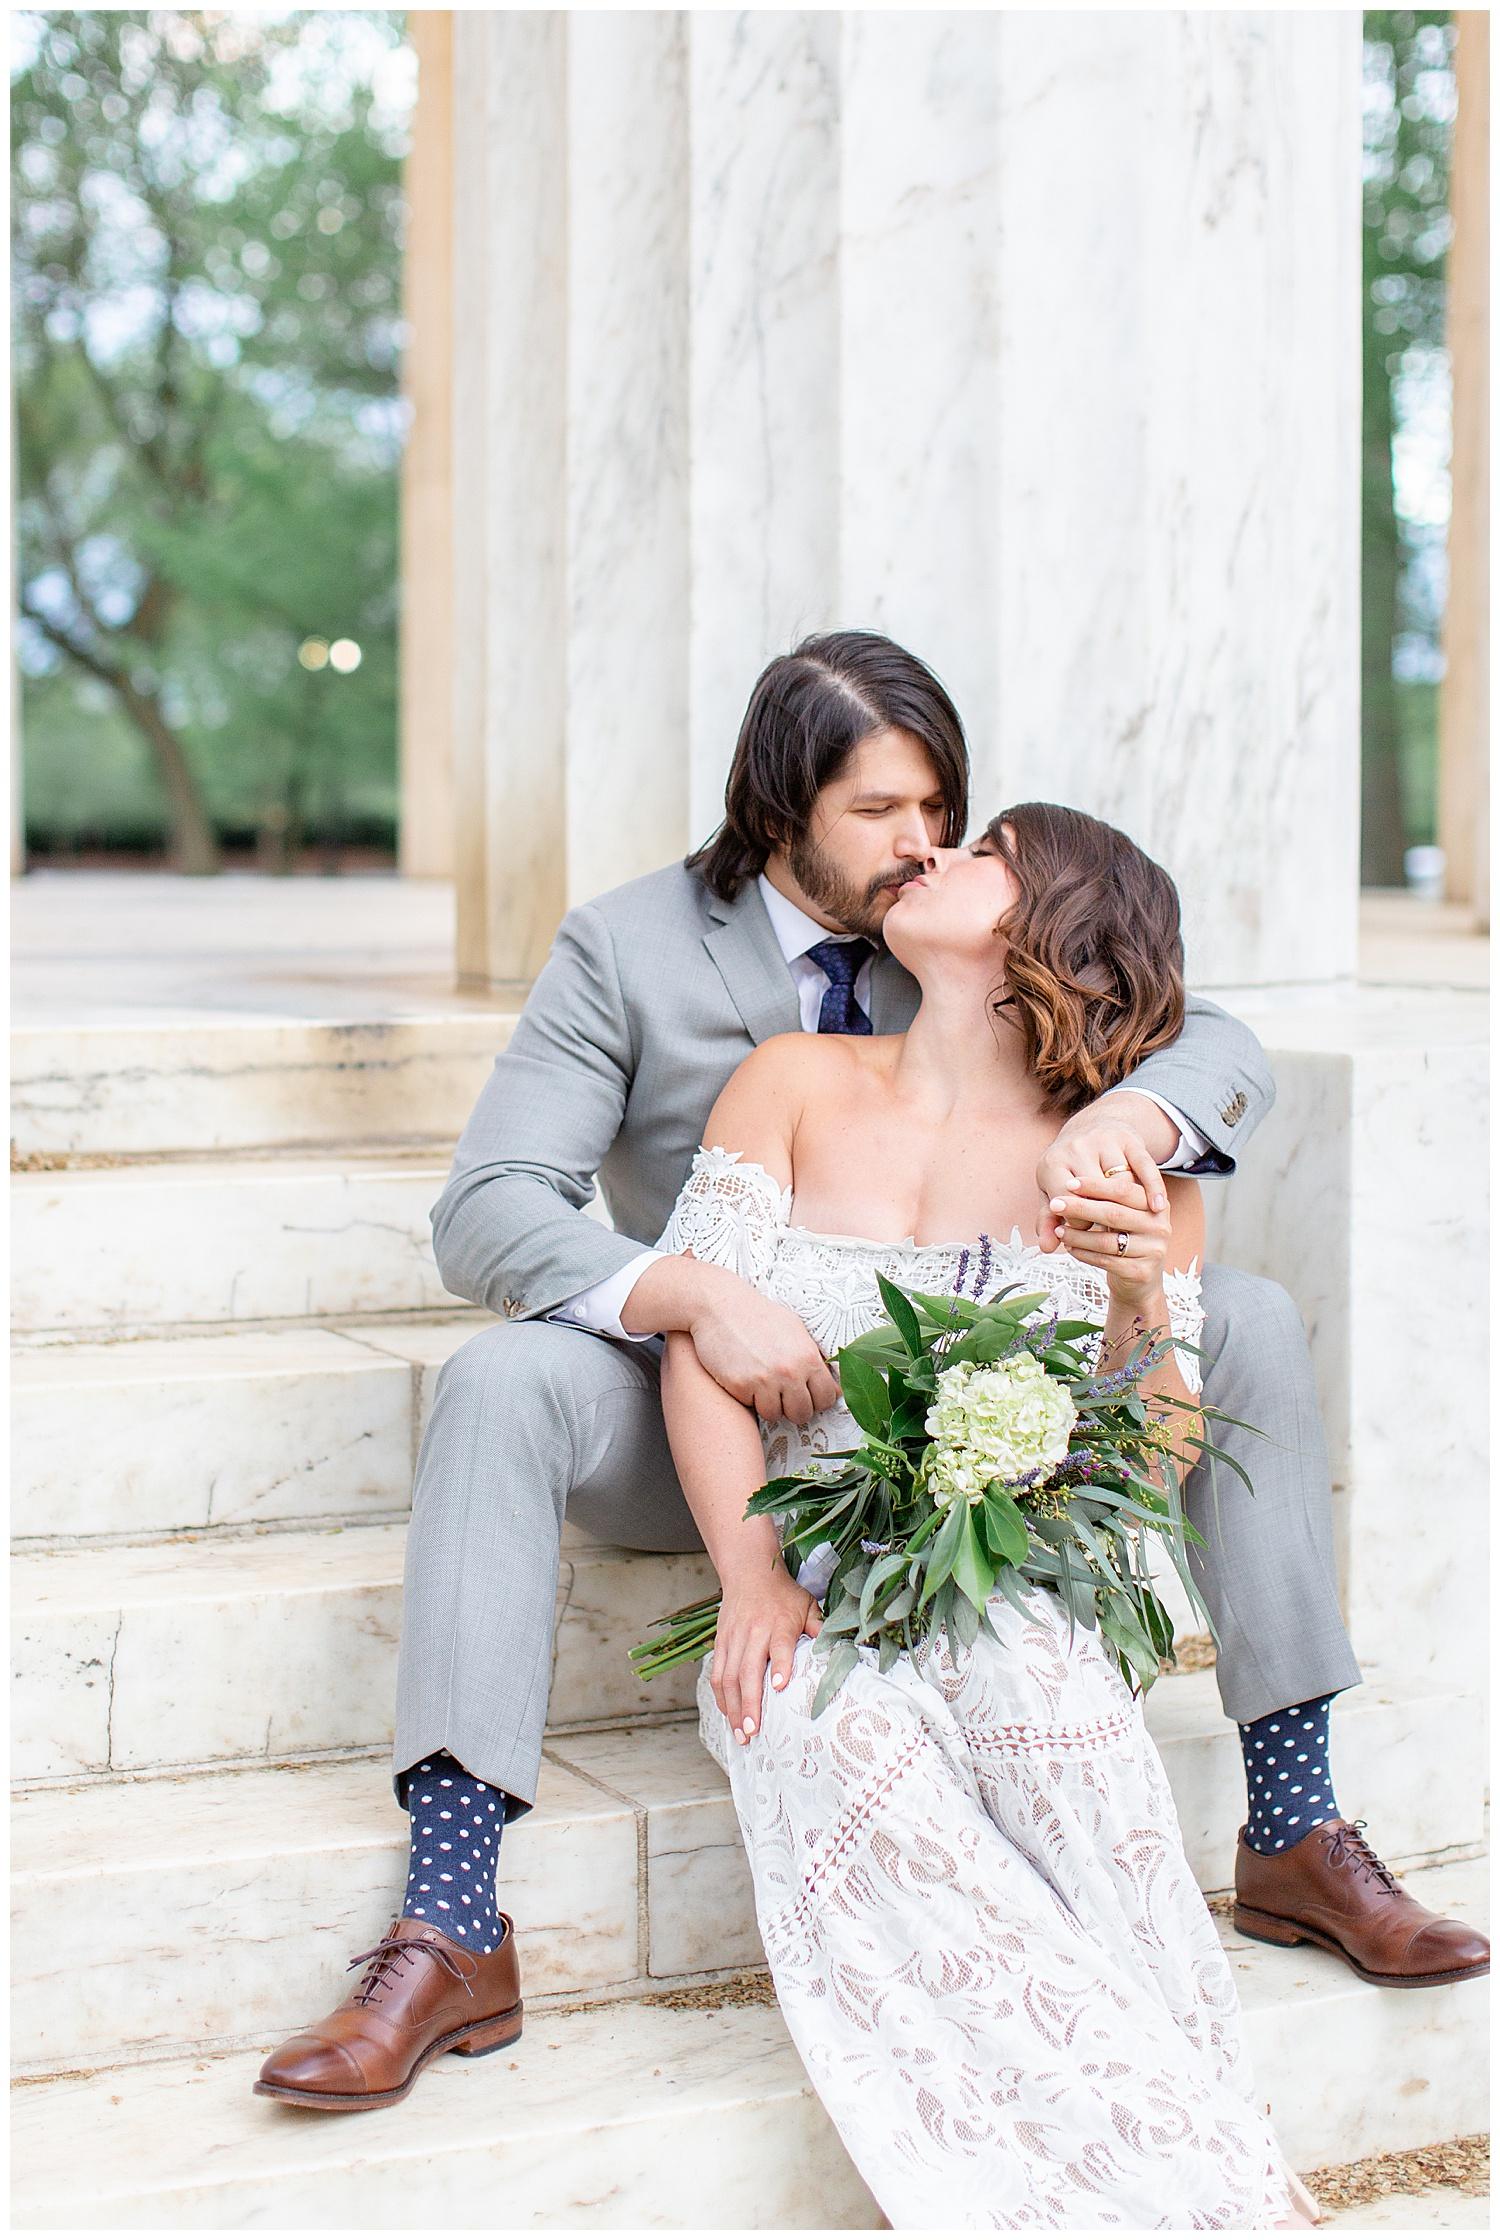 emily-belson-photography-washington-dc-wedding-37.jpg